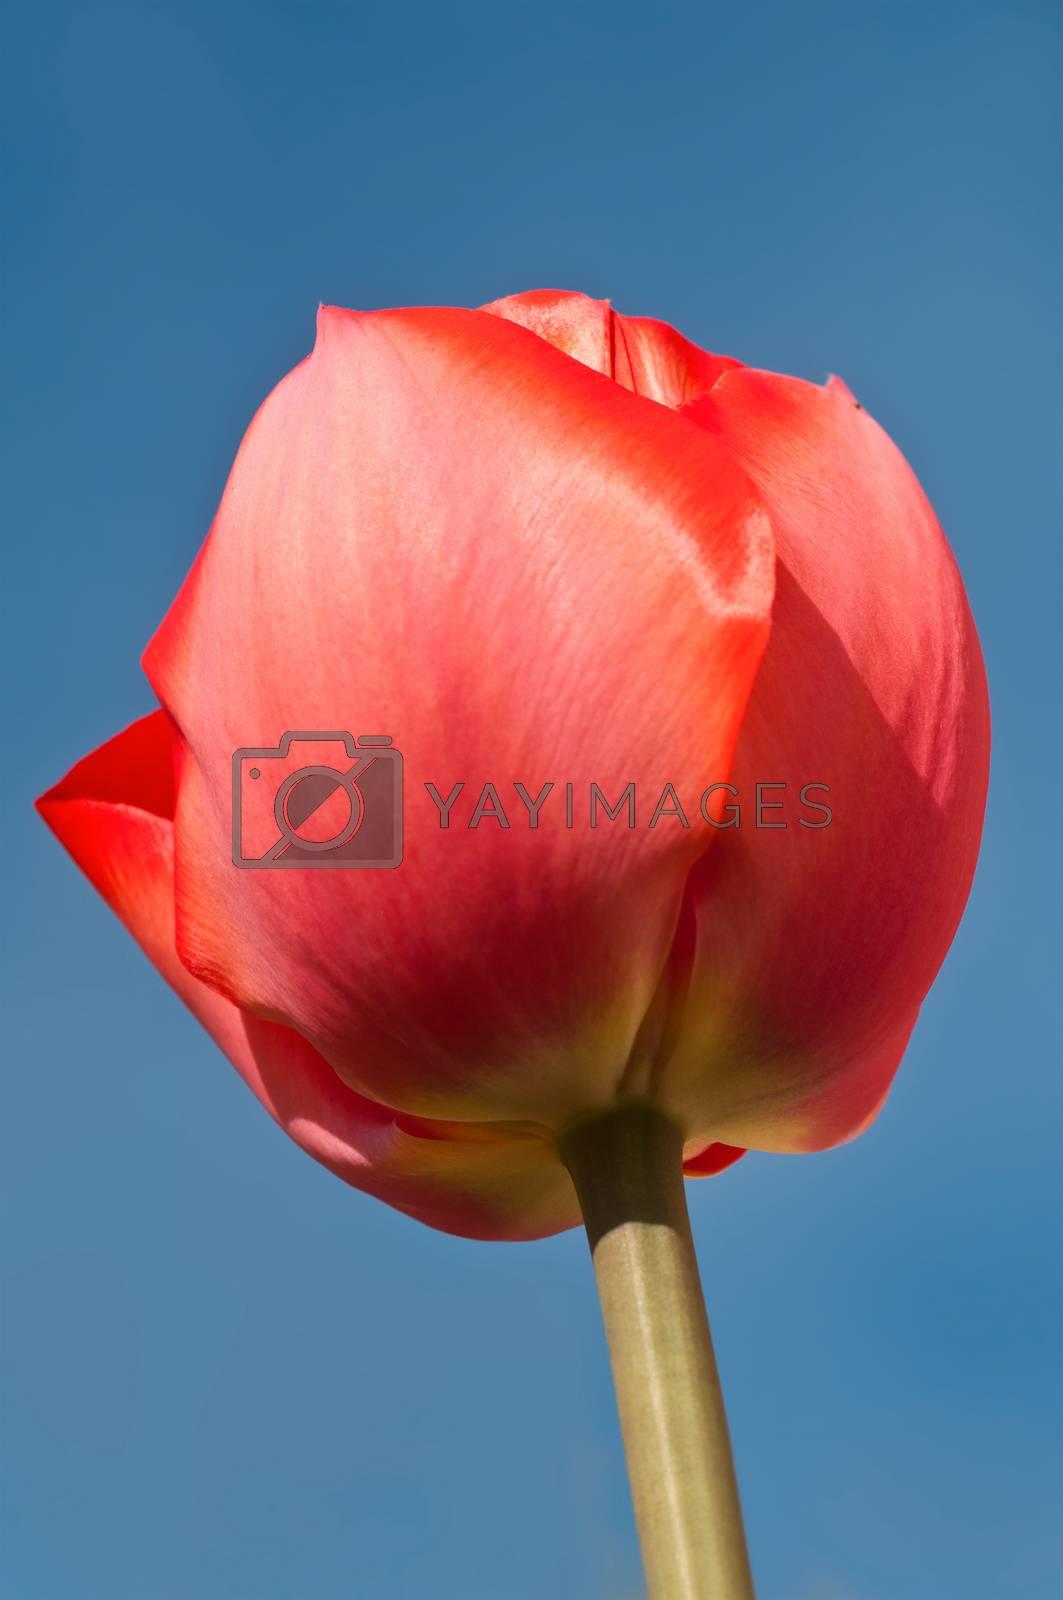 Royalty free image of Tulip on blue sky background by NeydtStock